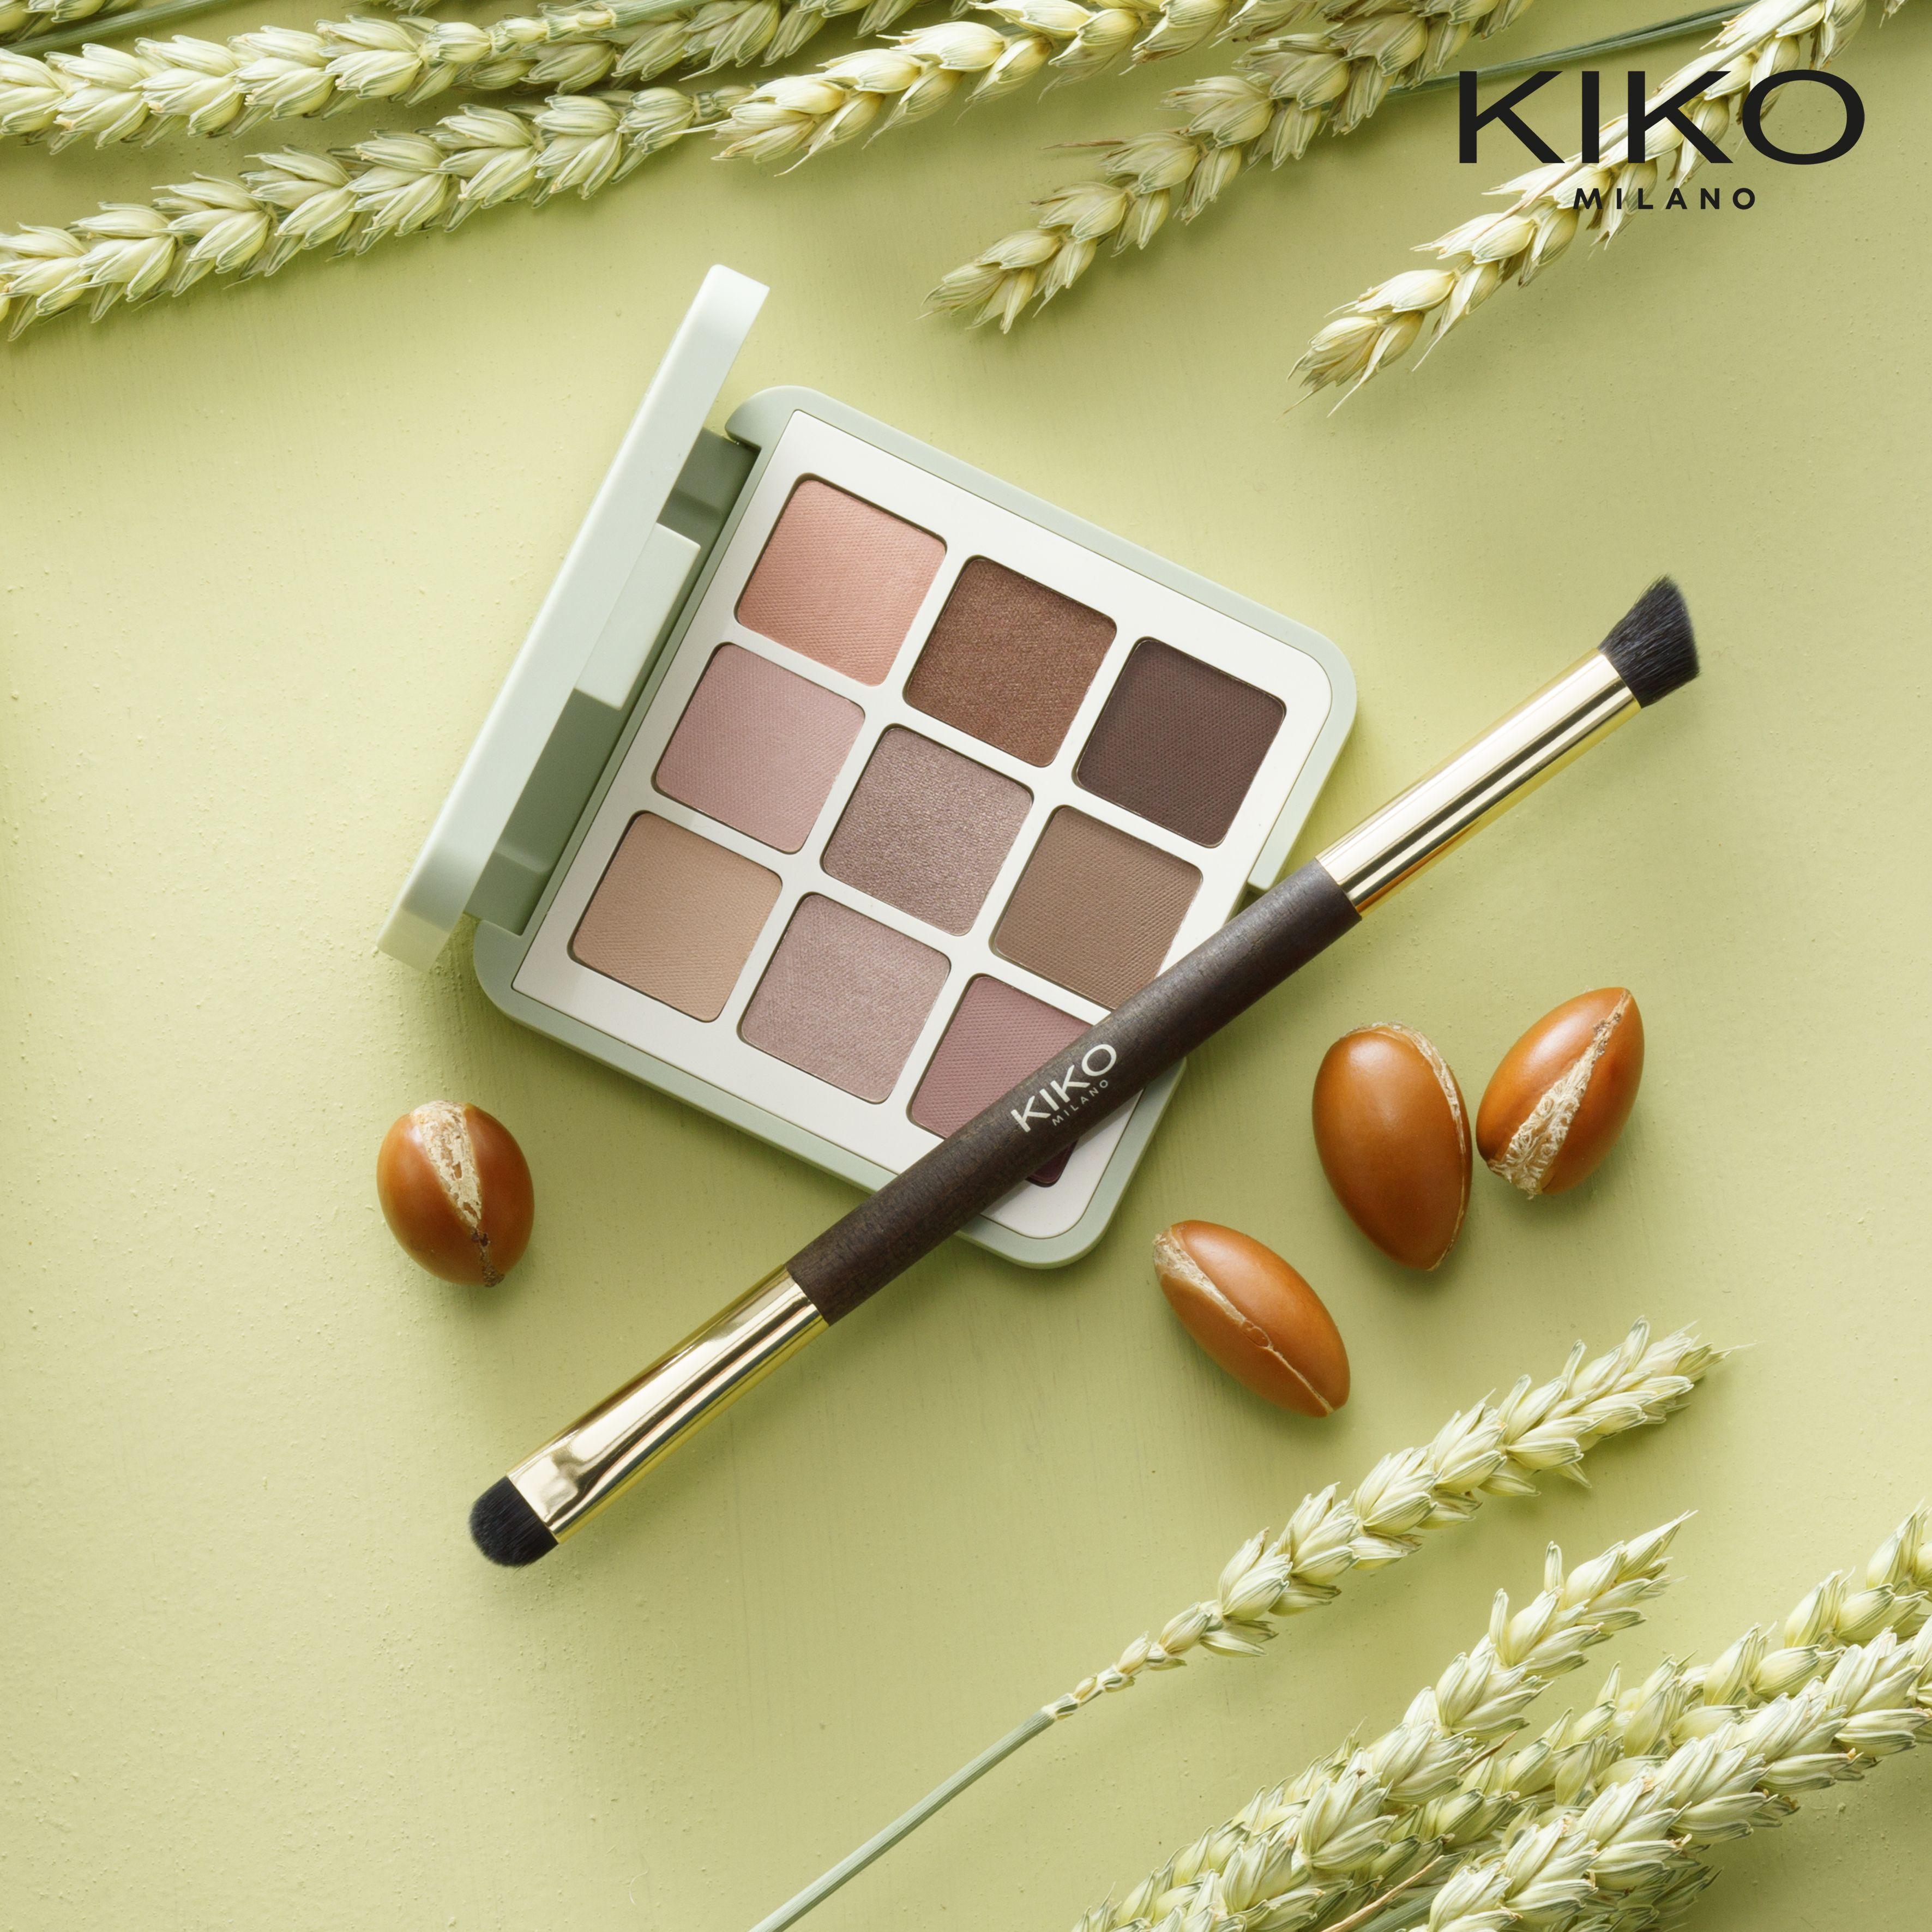 The revolution begins with nature KIKO MILANO presents